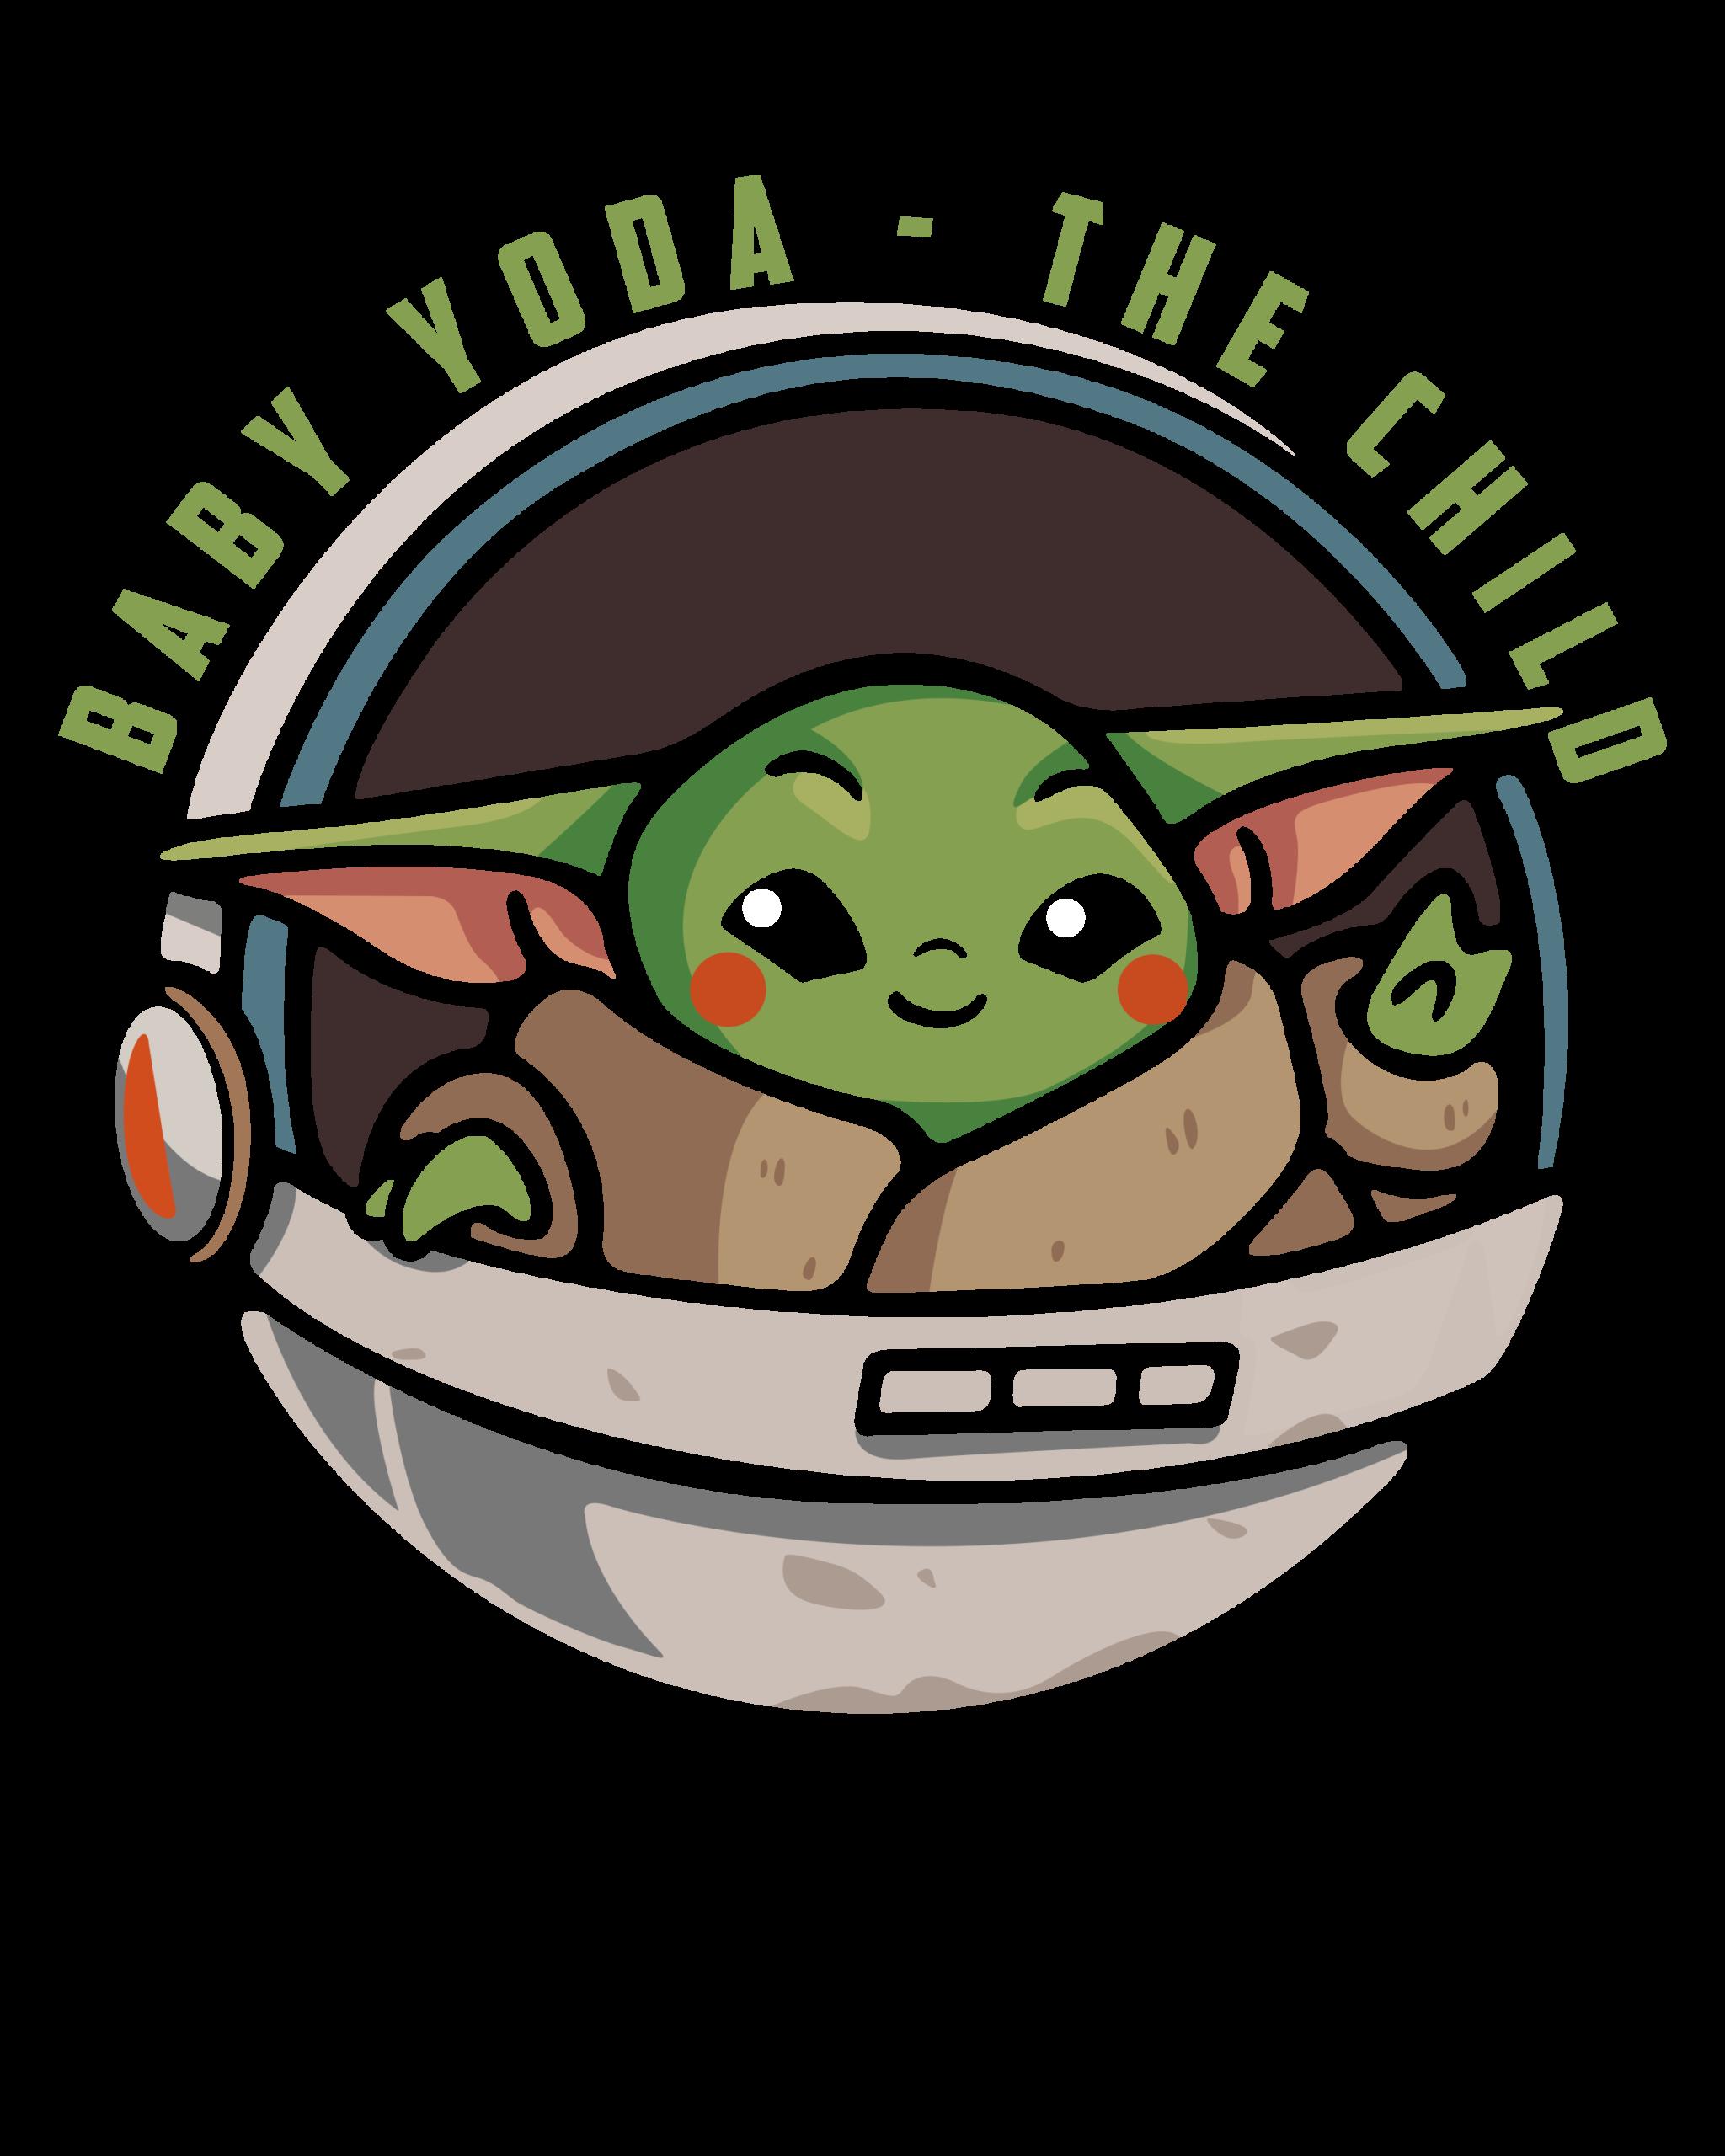 Pdn Baby Yoda The Child Ufo Shirt Hoodie Tank Top